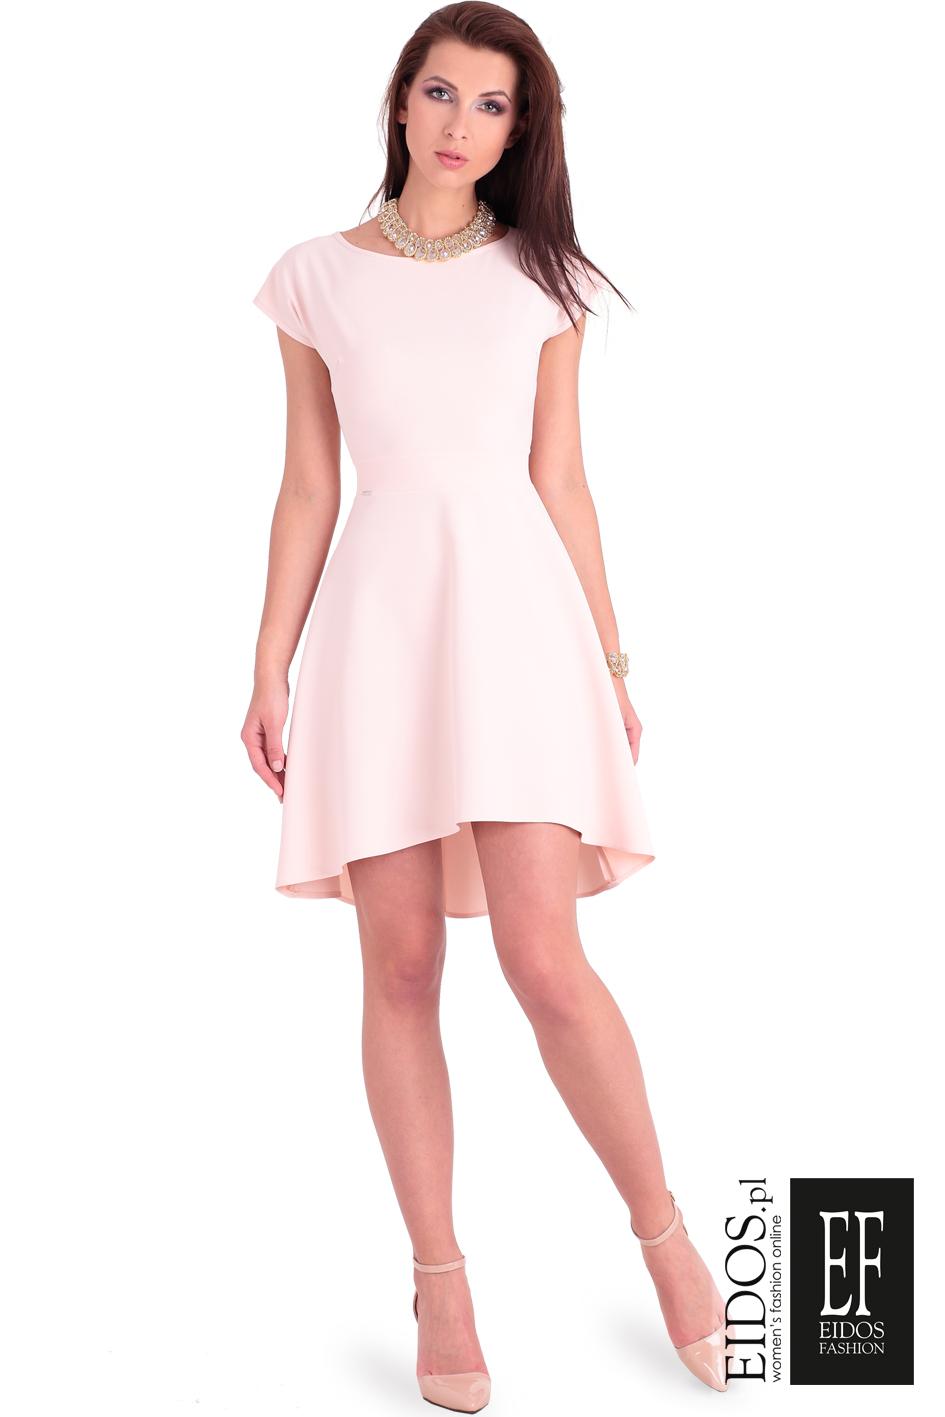 0aa82b05b0 Rozkloszowana sukienka na wesele BUENA VISTA pastelowa - EIDOS.p